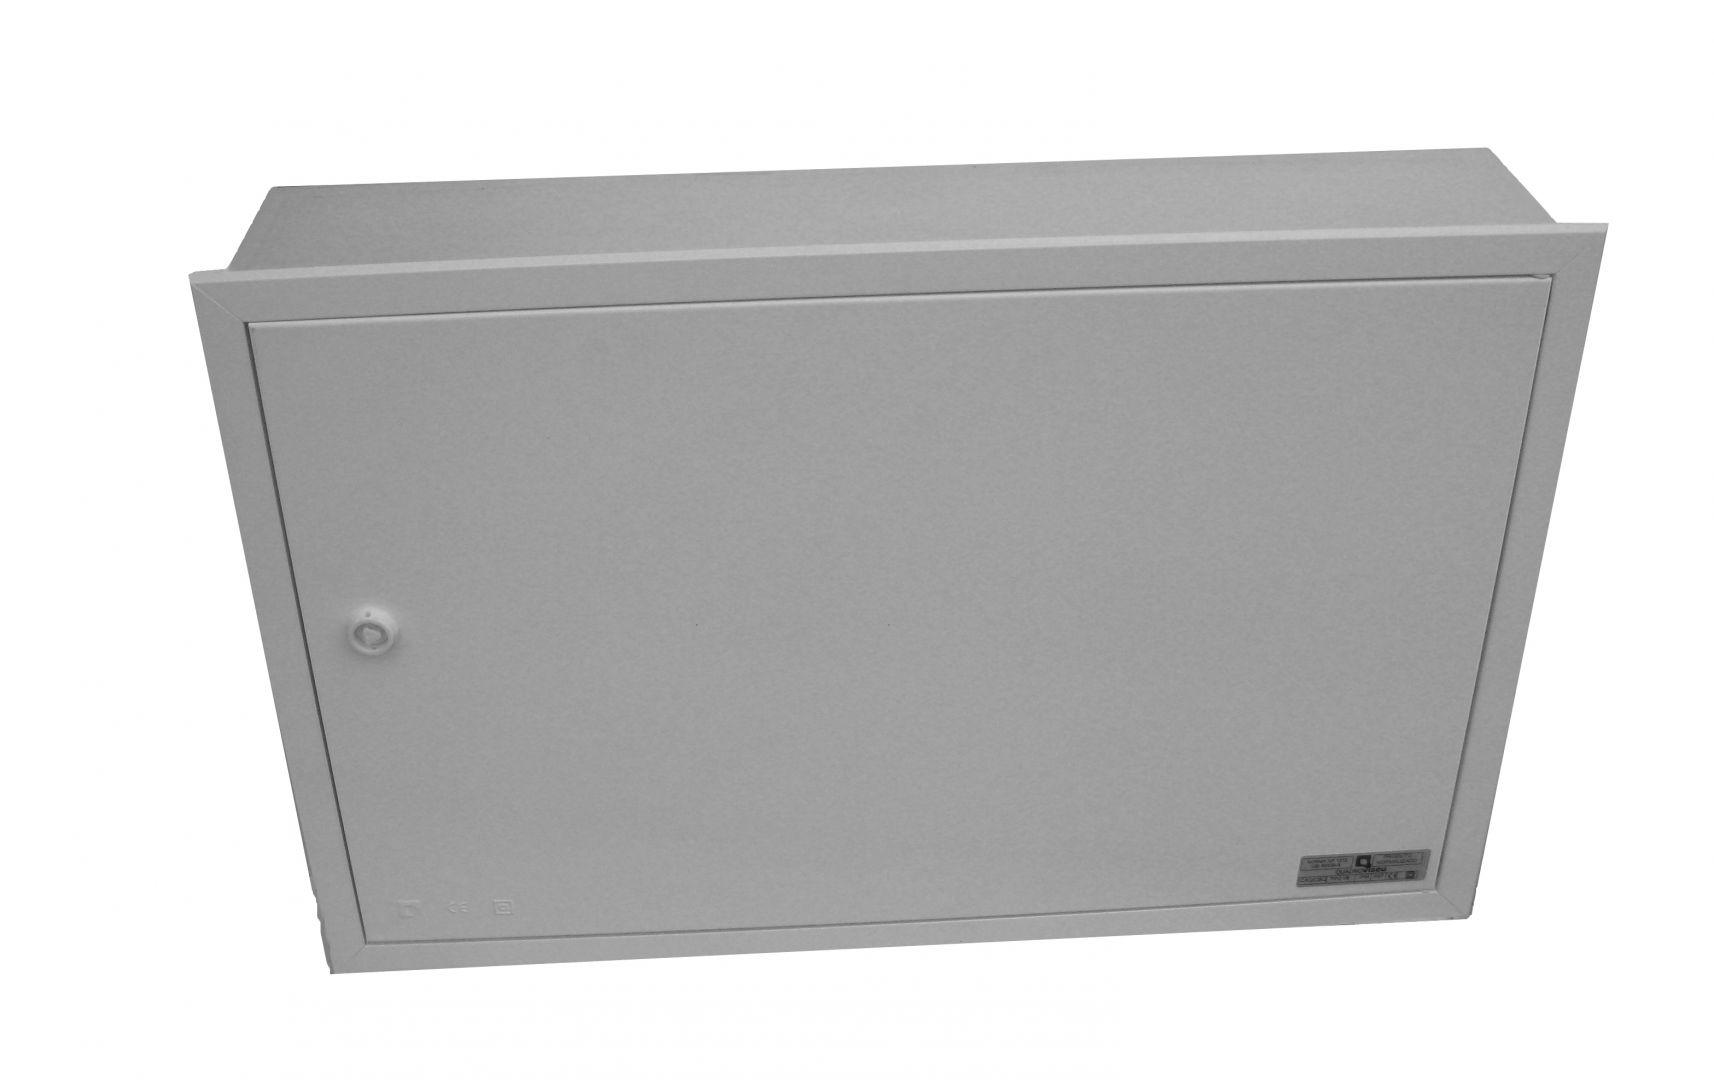 ENVELOPE VISBOX VIDE A ENCASTRER AVEC PORTE 500X400X130